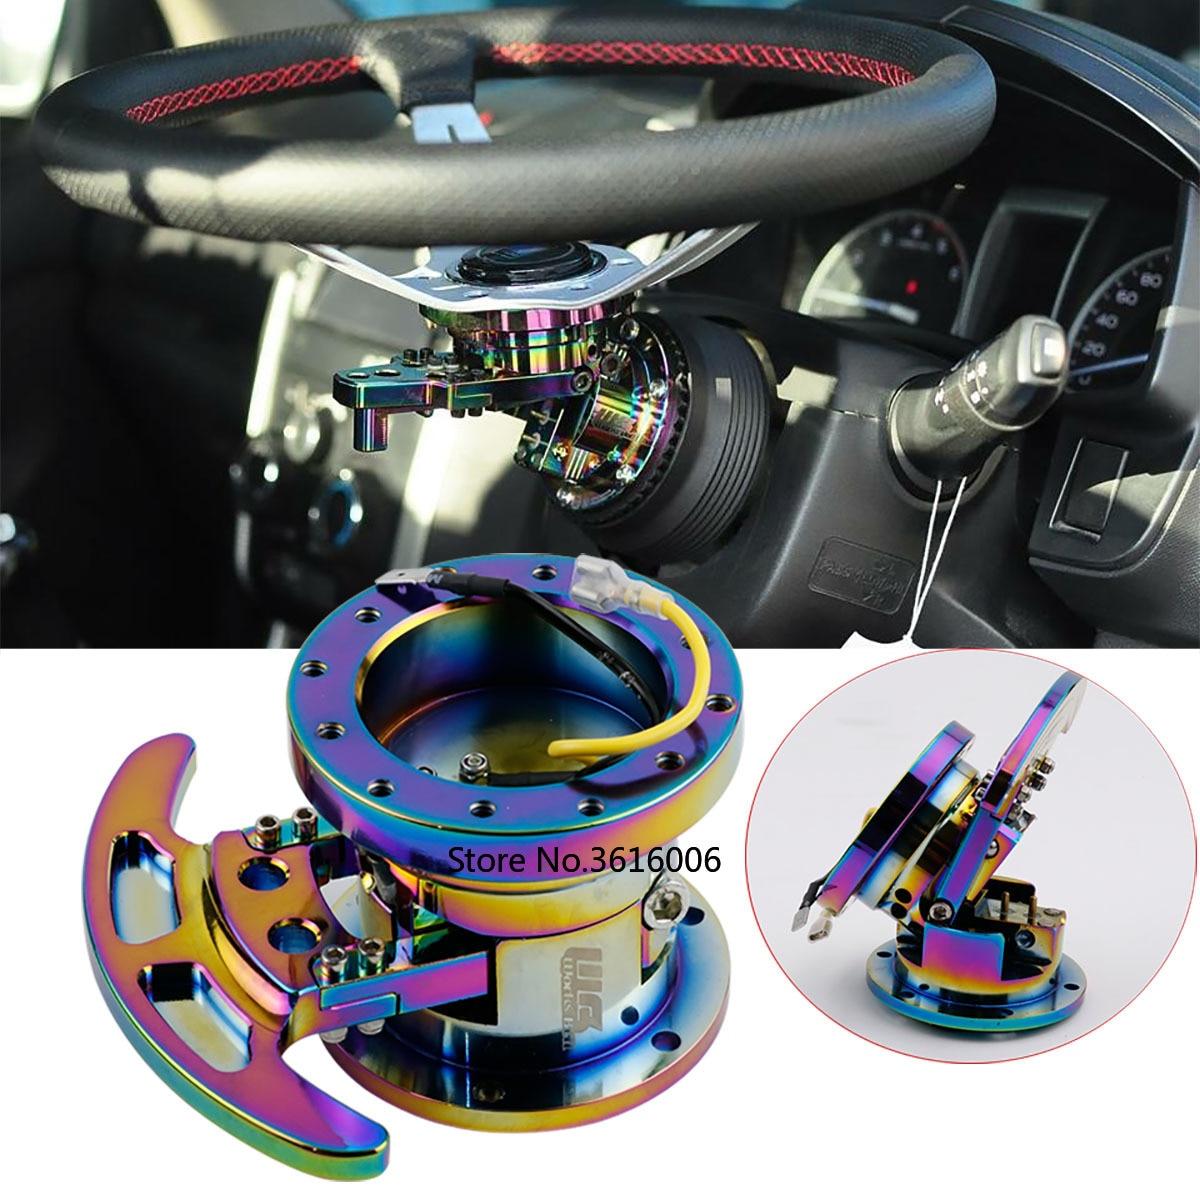 New High WORKS BELL GTC Tilt Racing Steering Wheel Quick Release Hub Kit Adapter Body Removable Snap Off Boss Kit